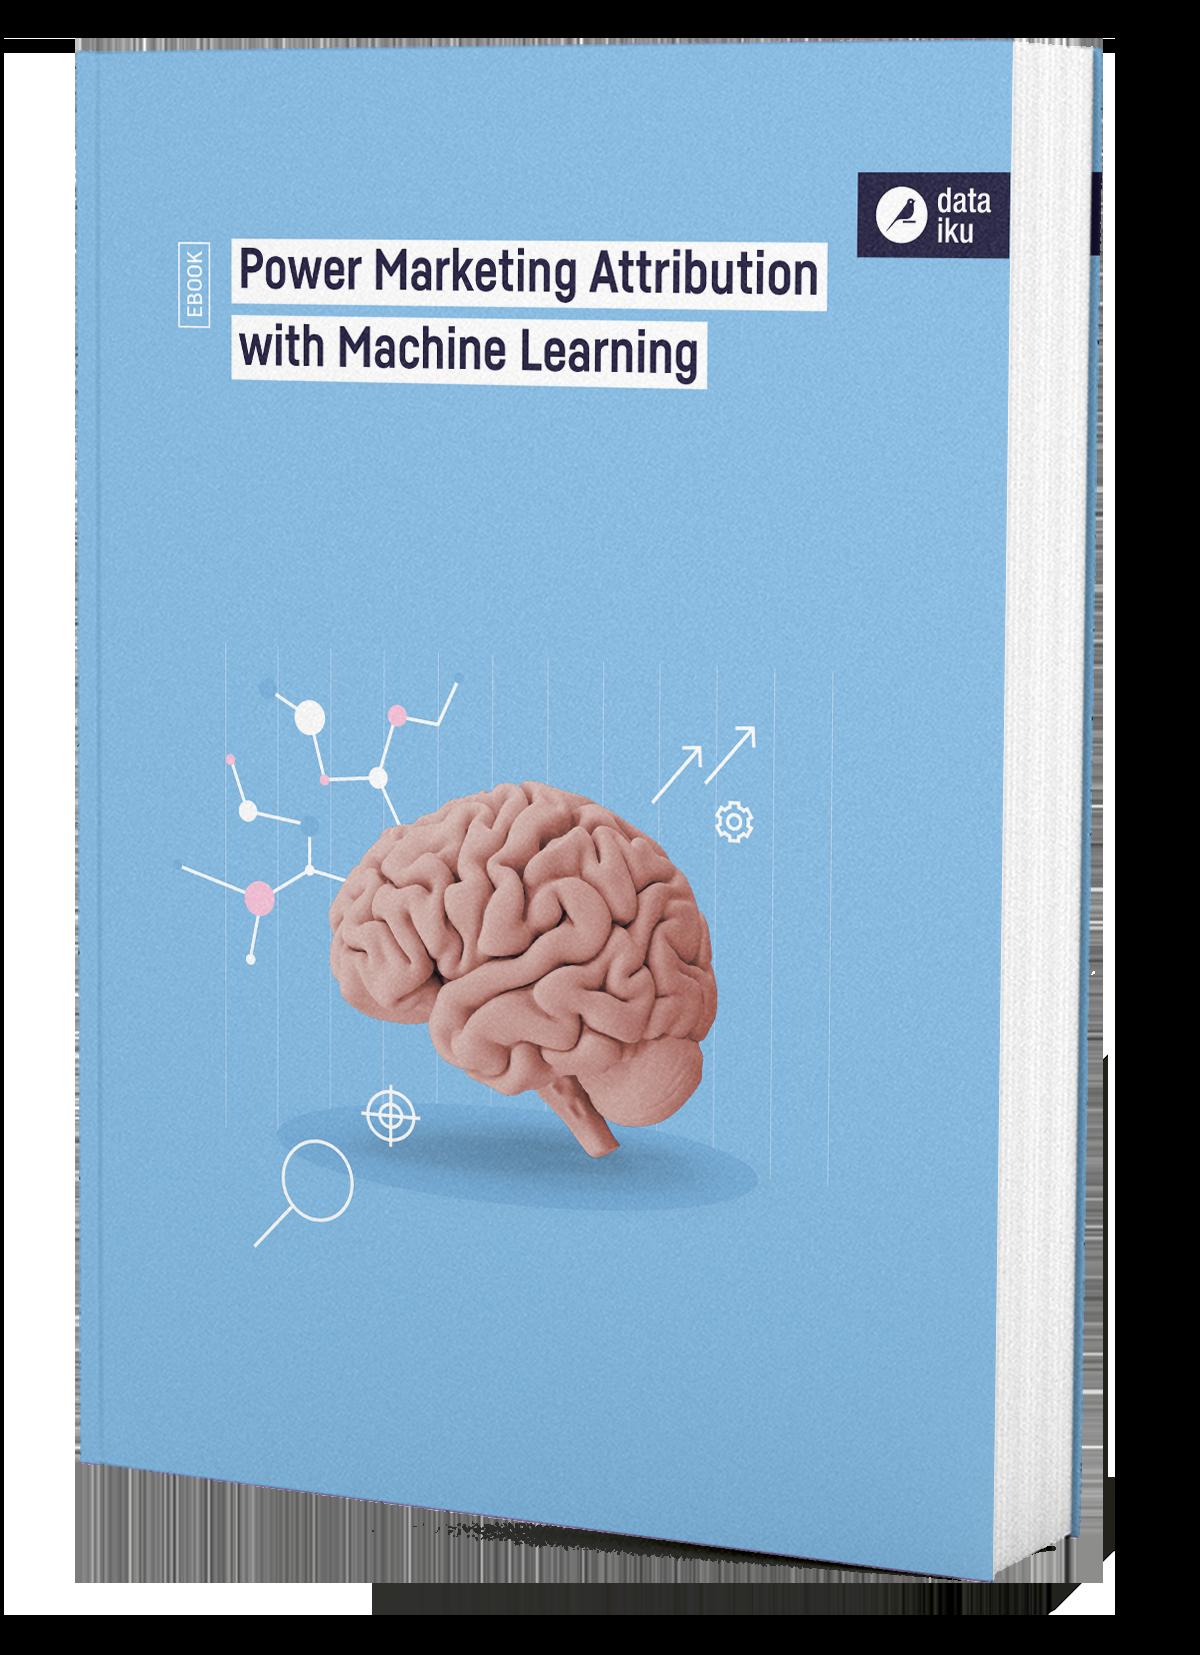 DKU-DATAIKU-EBOOK_COVER-WEB-POWER_MARKETING_ATTRIBUTION_WITH_MACHINE_LEARNING-BAT_210520